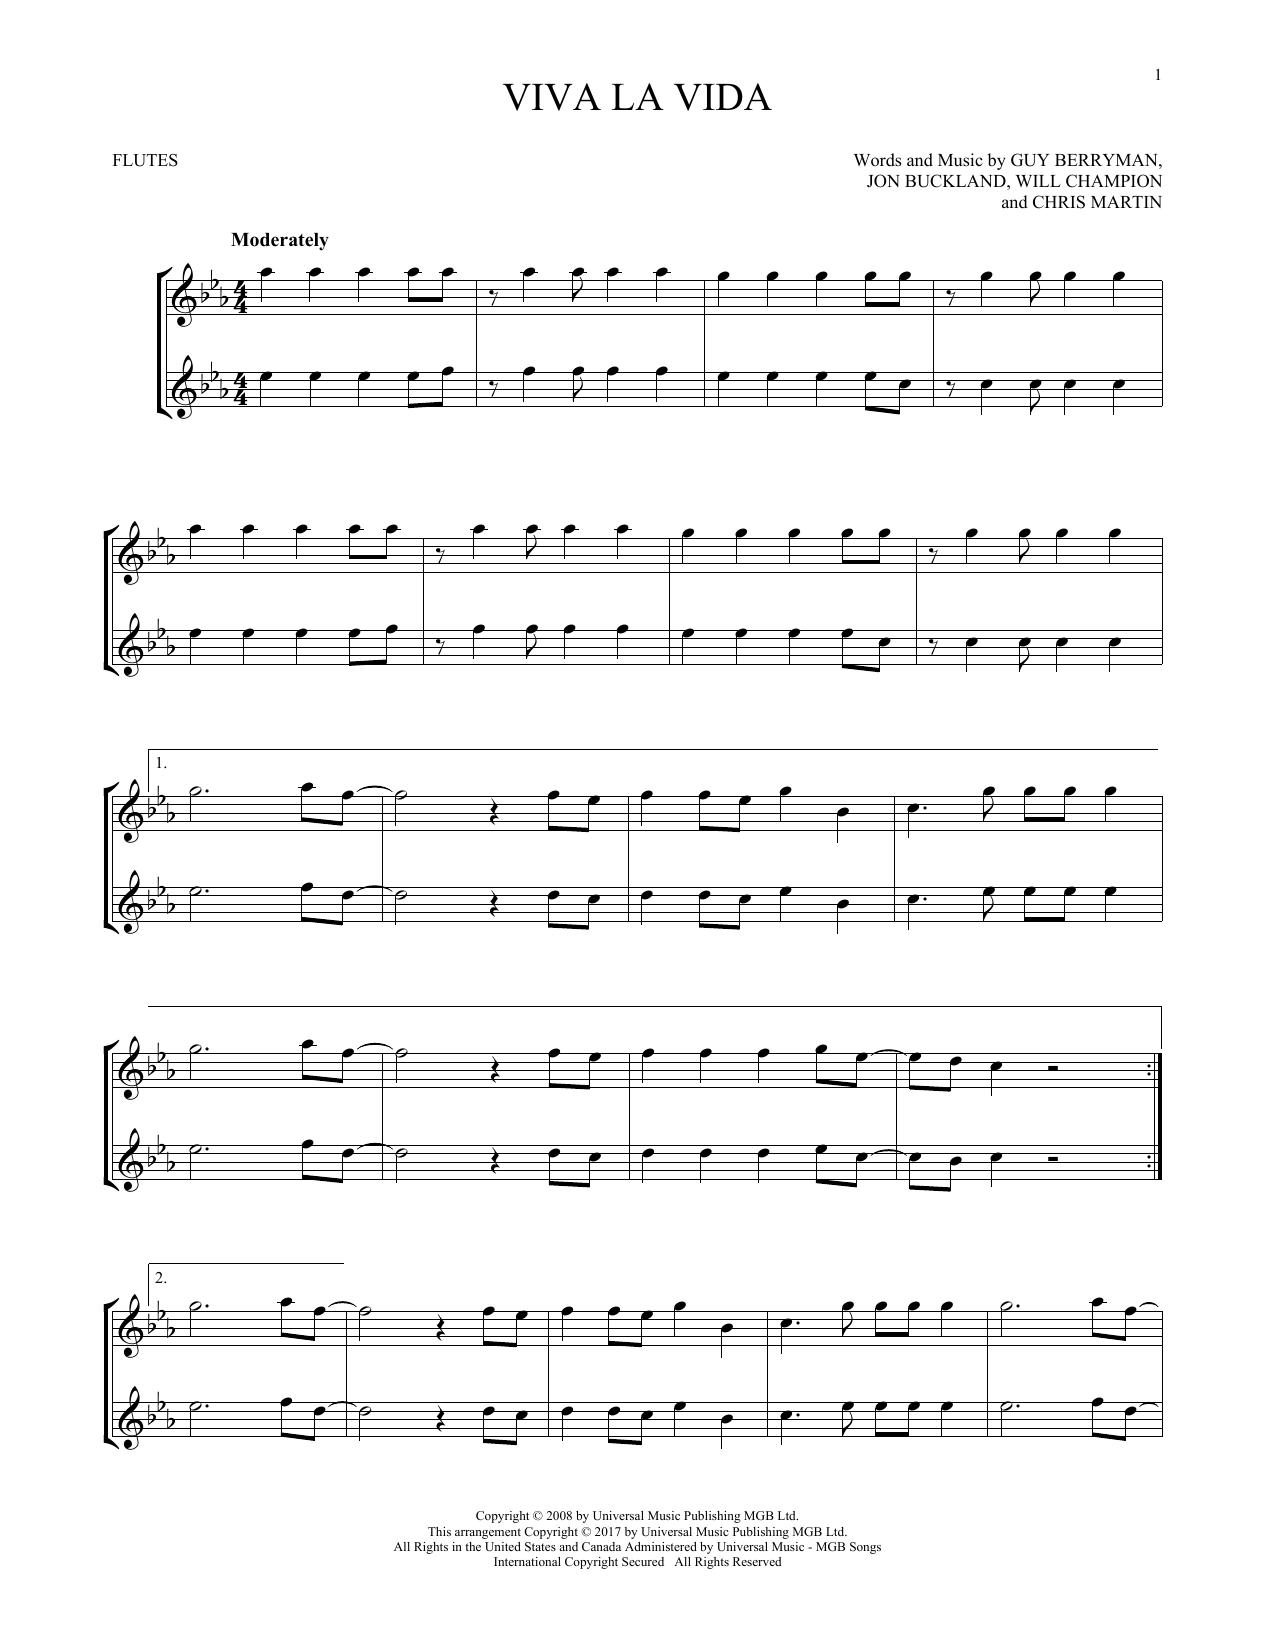 Viva La Vida Chords Sheet Music Digital Files To Print Licensed Guy Berryman Digital